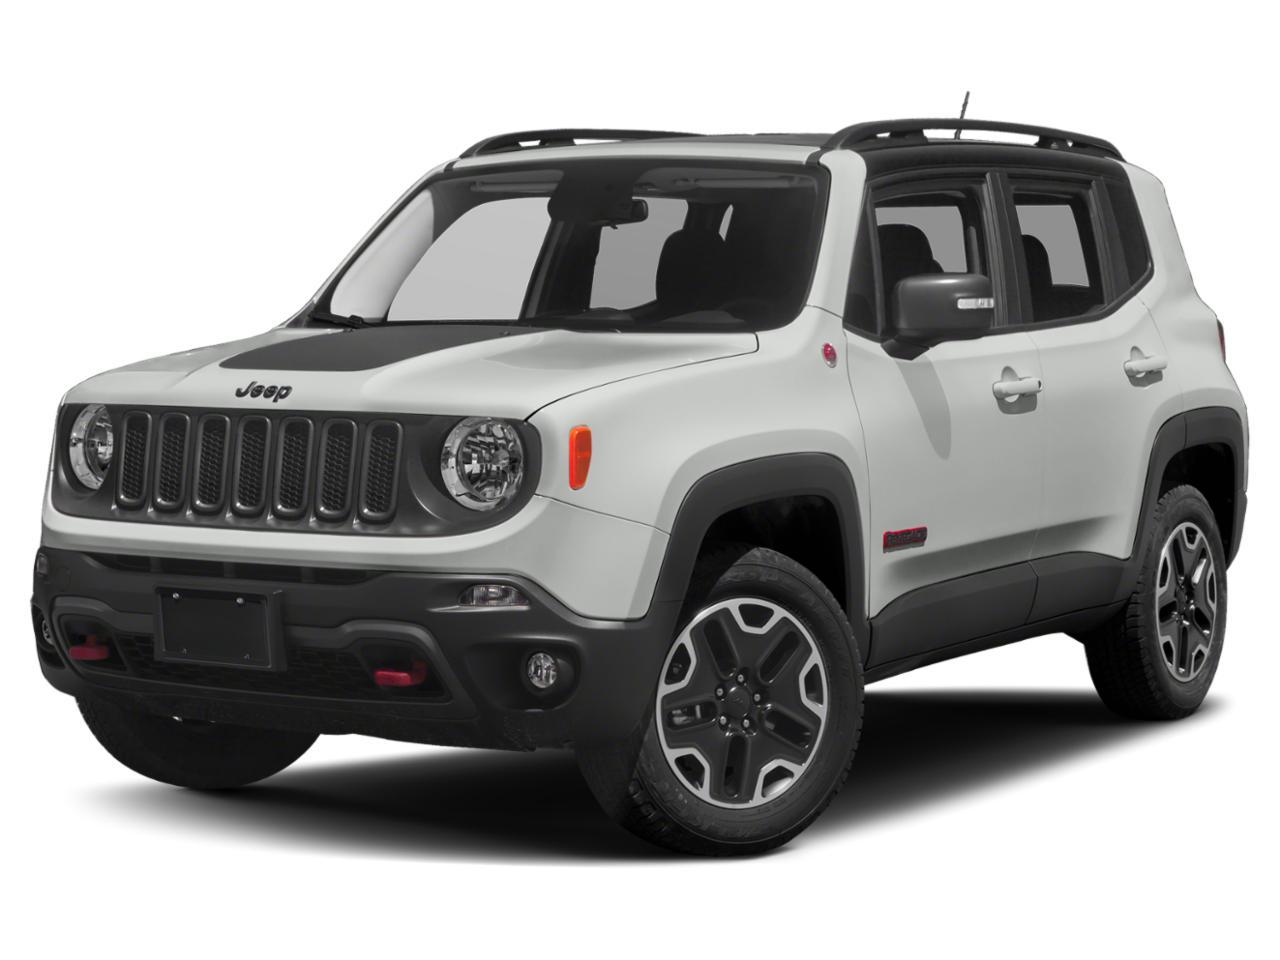 2018 Jeep Renegade Vehicle Photo in Colorado Springs, CO 80905